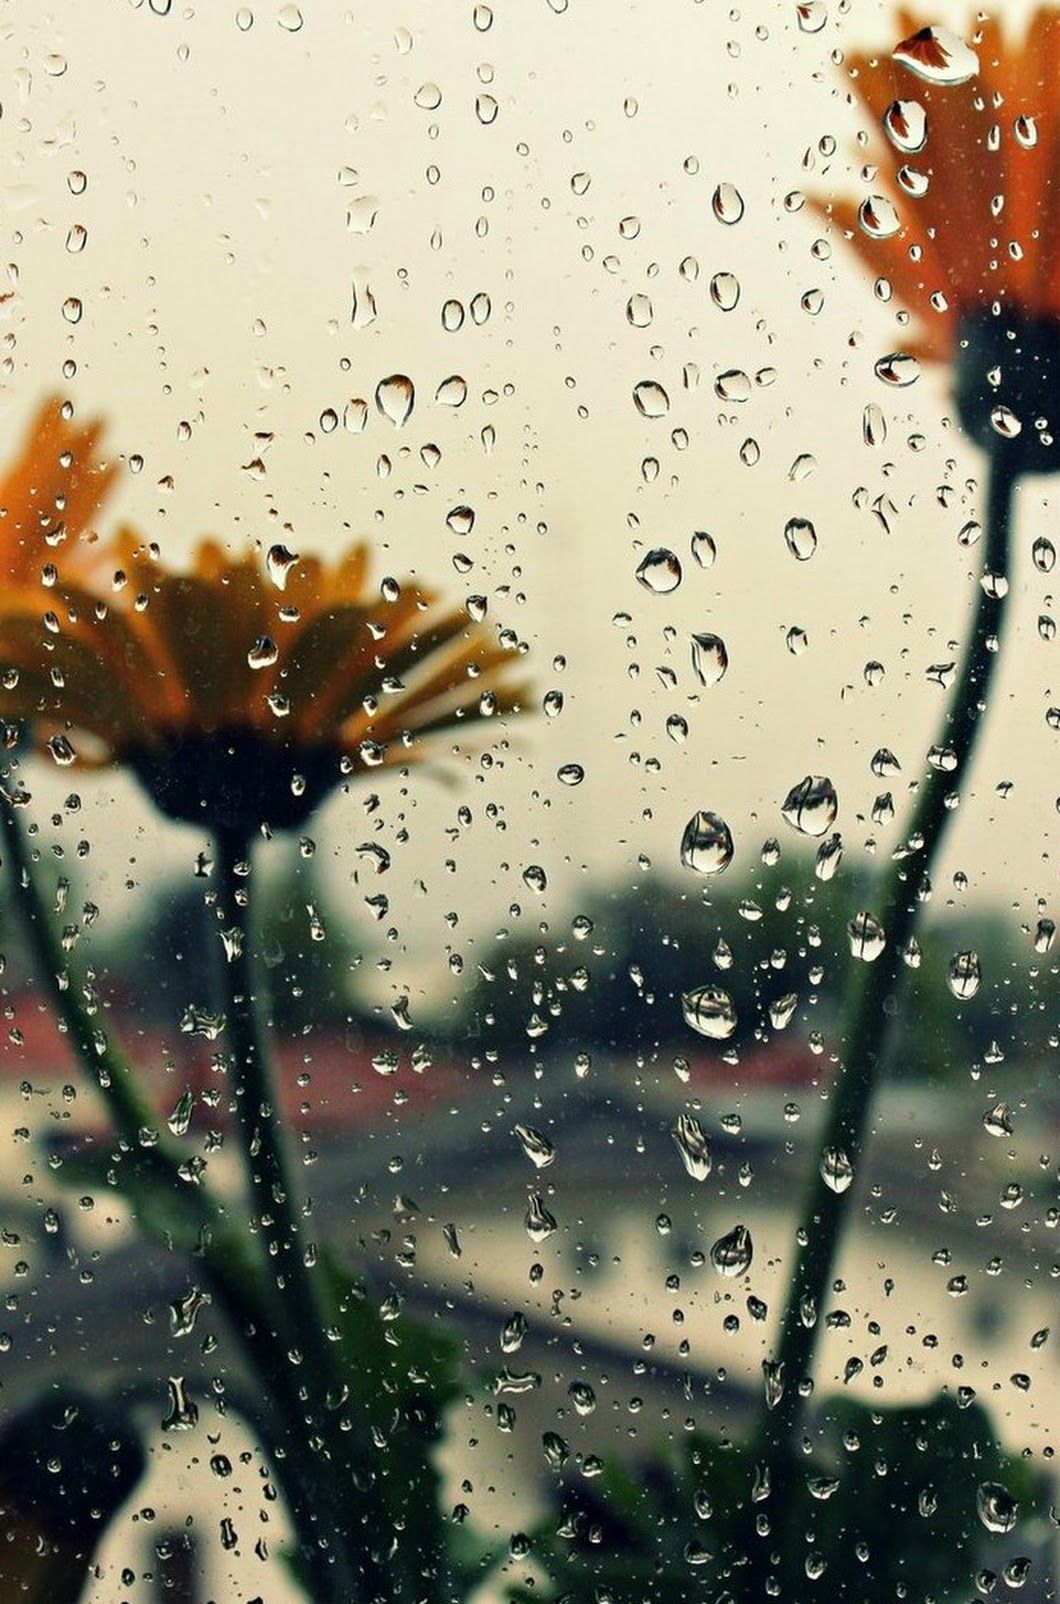 Sign in Rain wallpapers Rainy wallpaper Rain photography 1060x1604